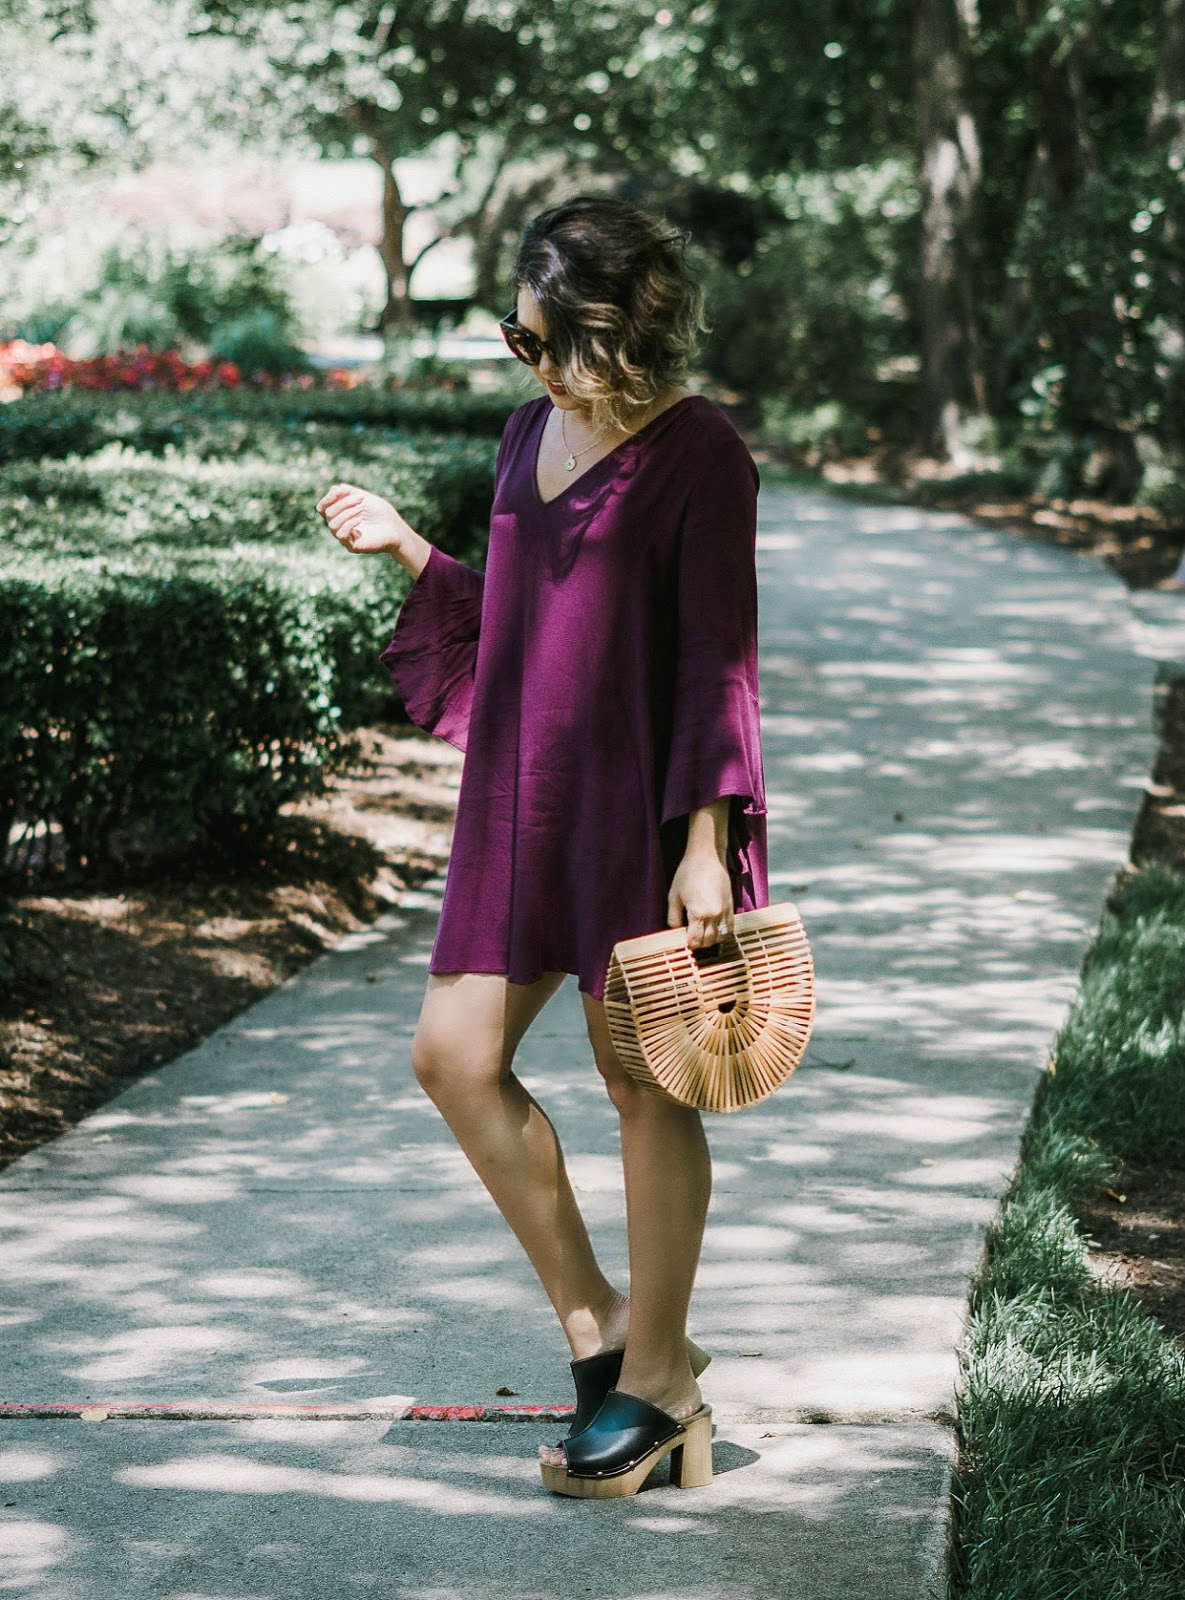 cult gaia bamboo bag, lush bell sleeve dress, celine audrey